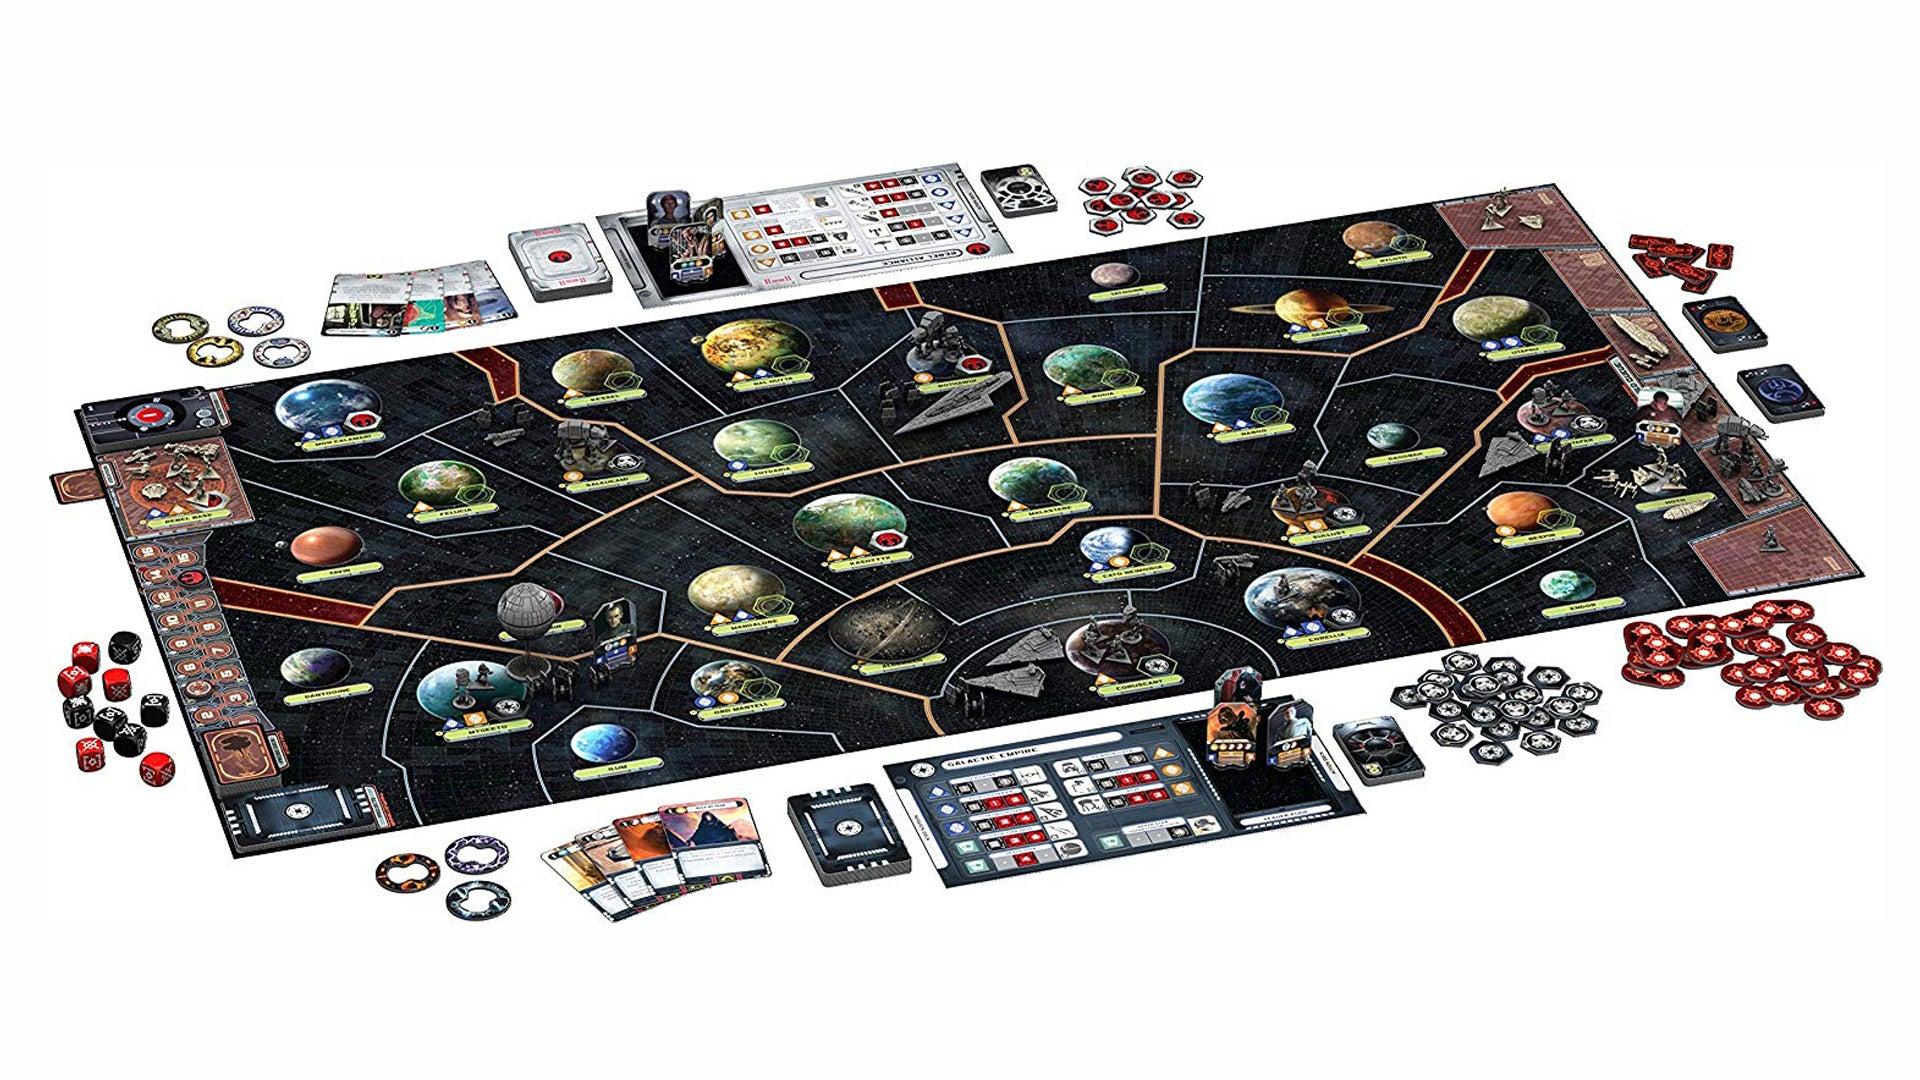 Star Wars: Rebellion board game layout